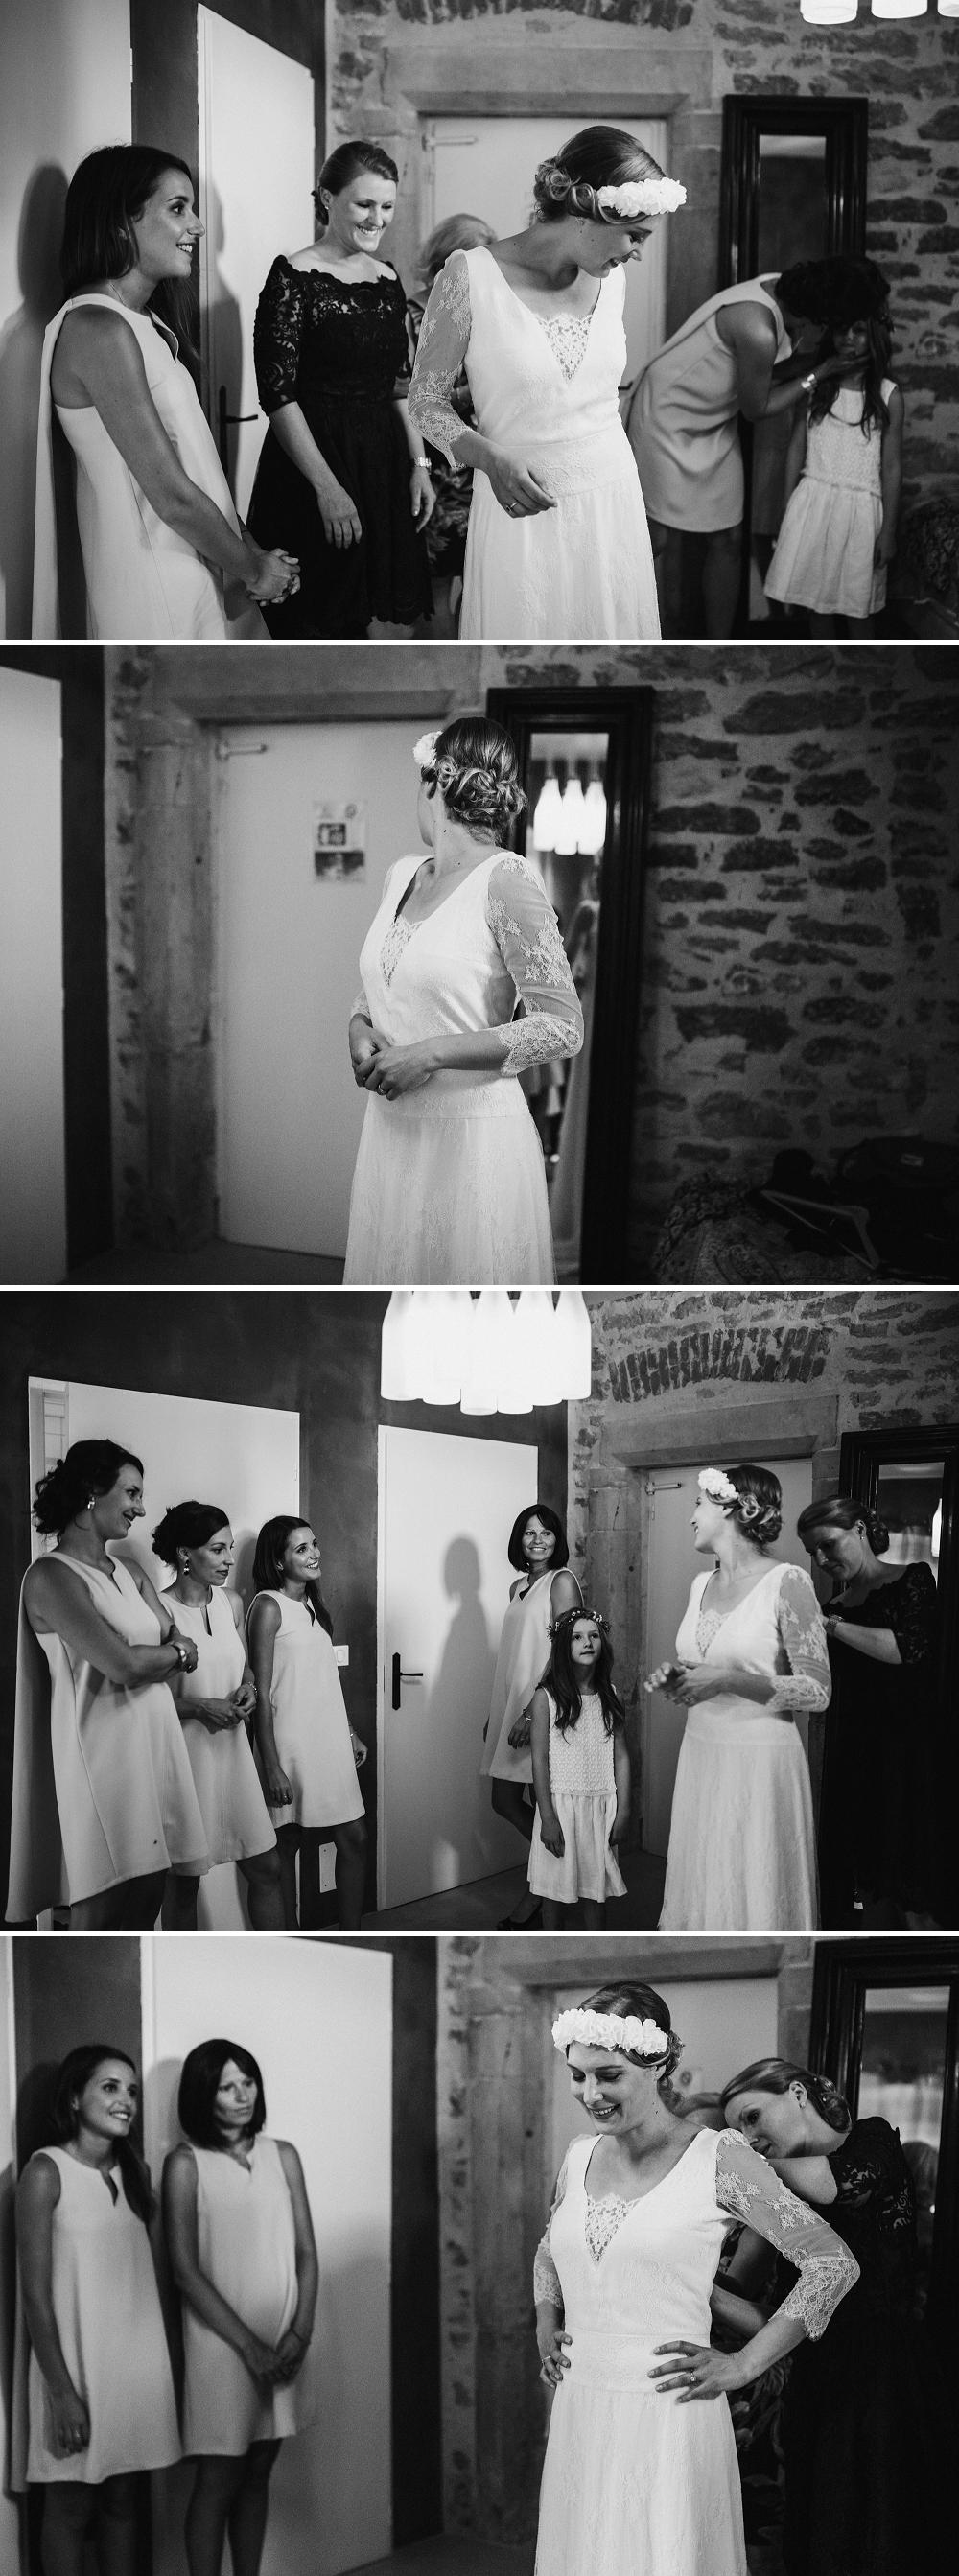 mariage-morimont-06.jpg